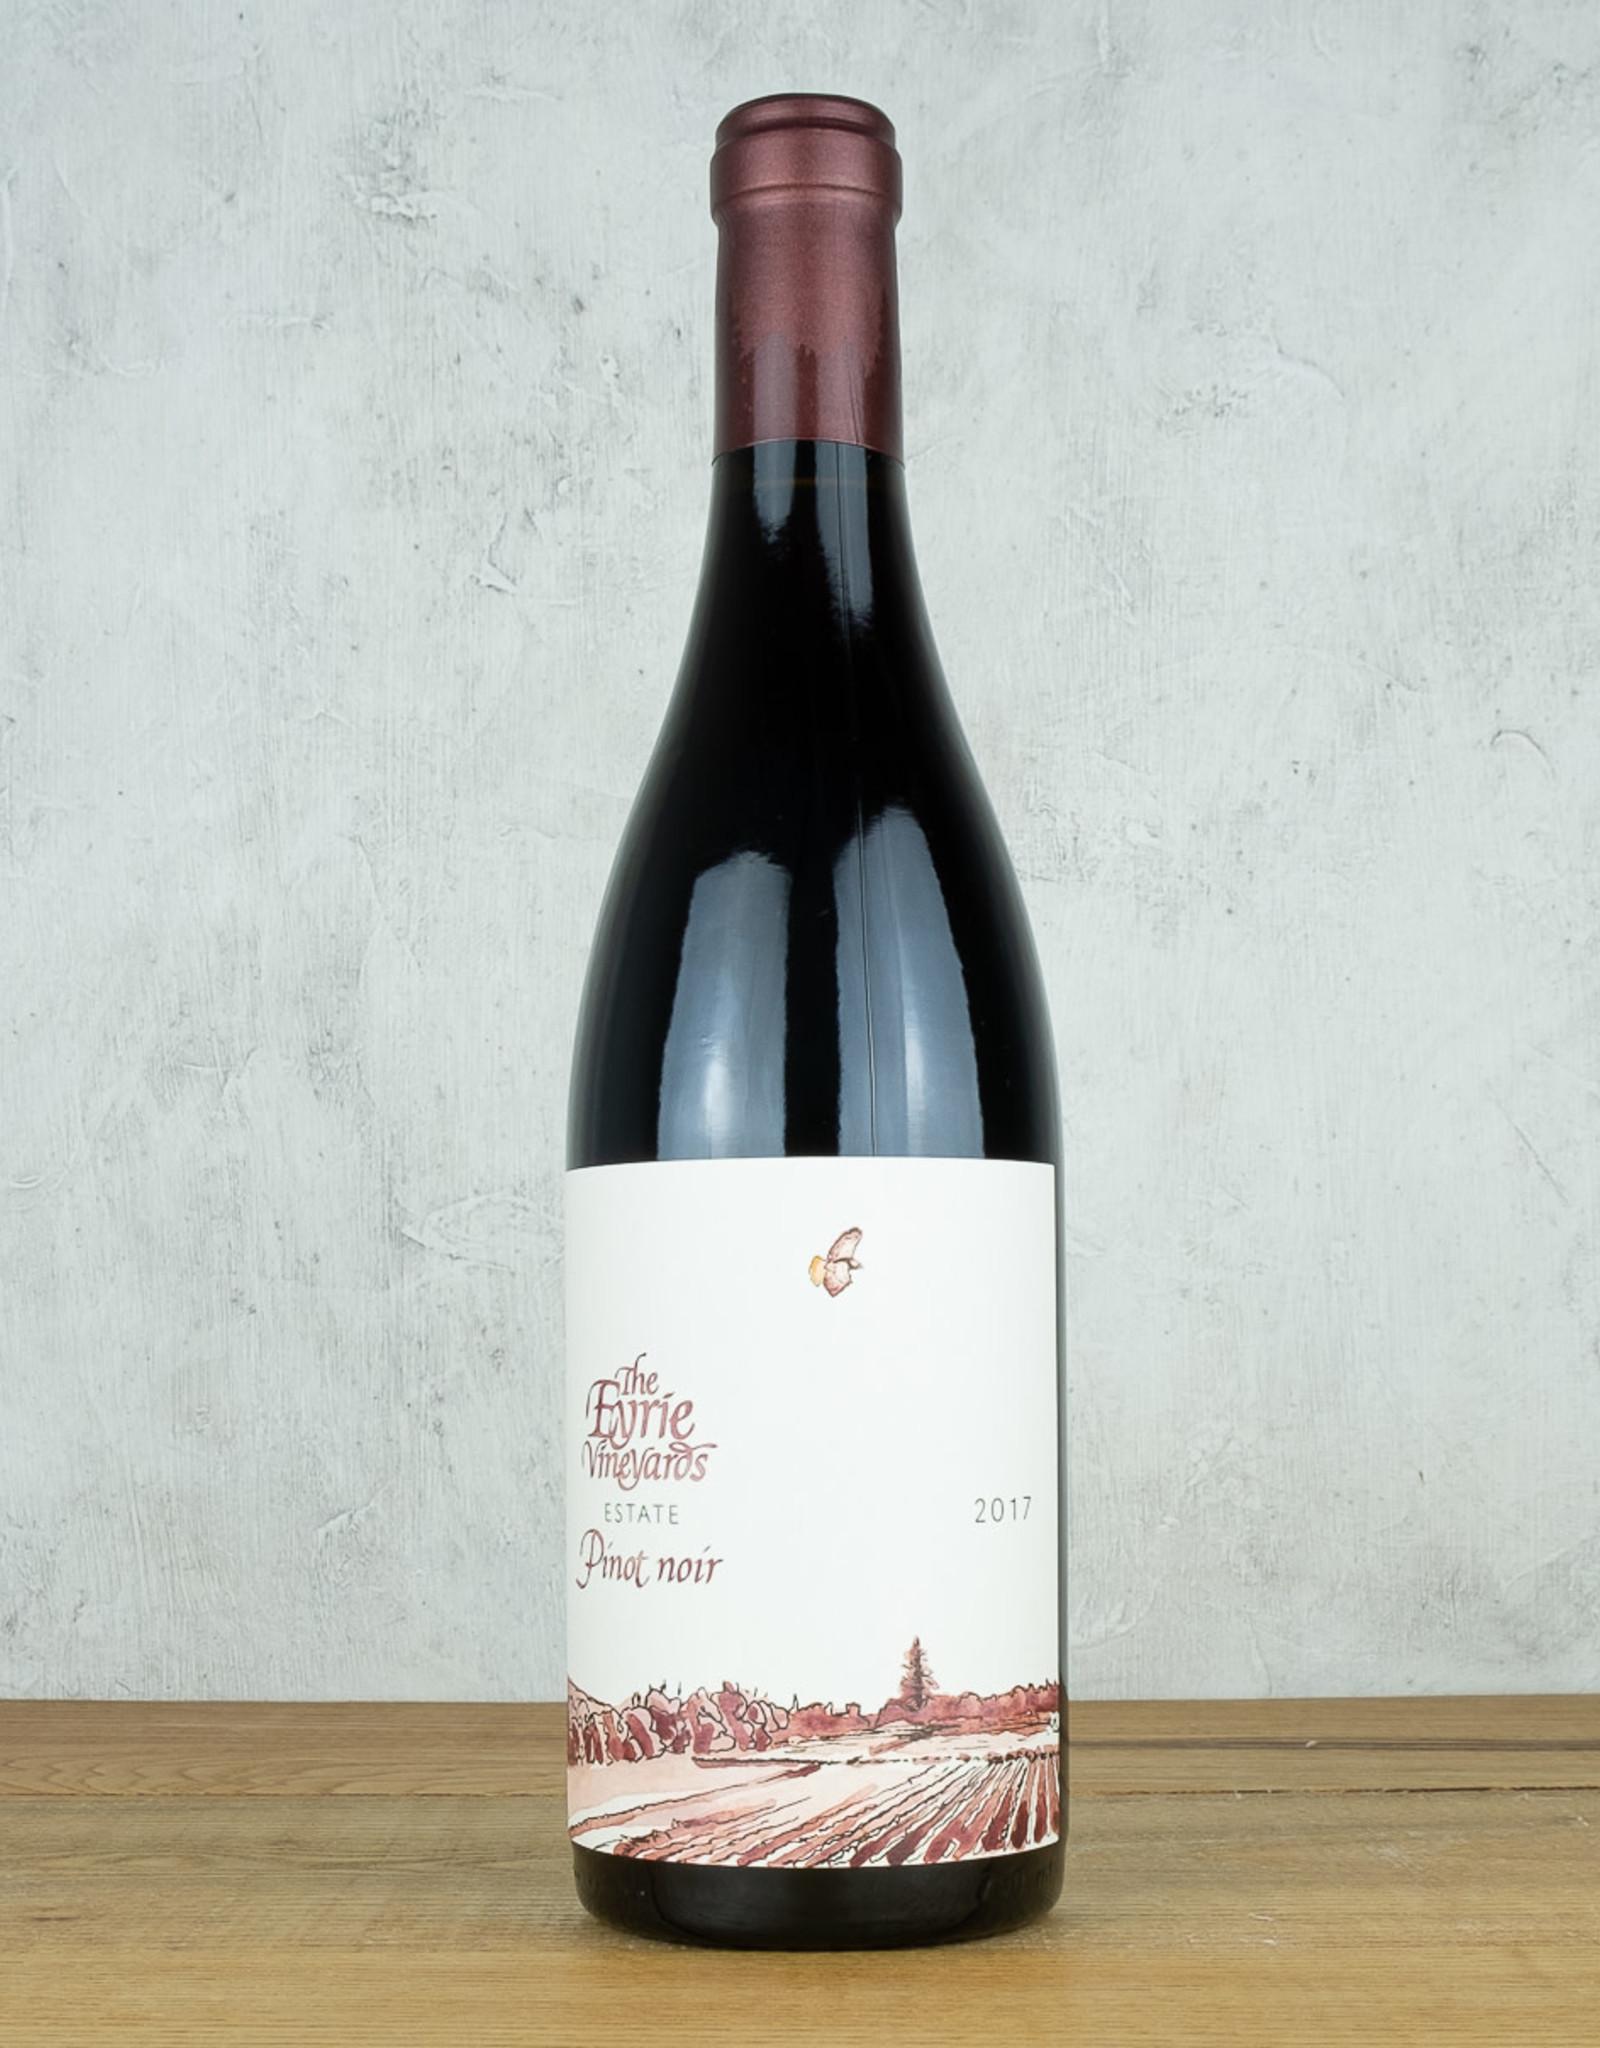 The Eyrie Vineyards Estate Pinot Noir